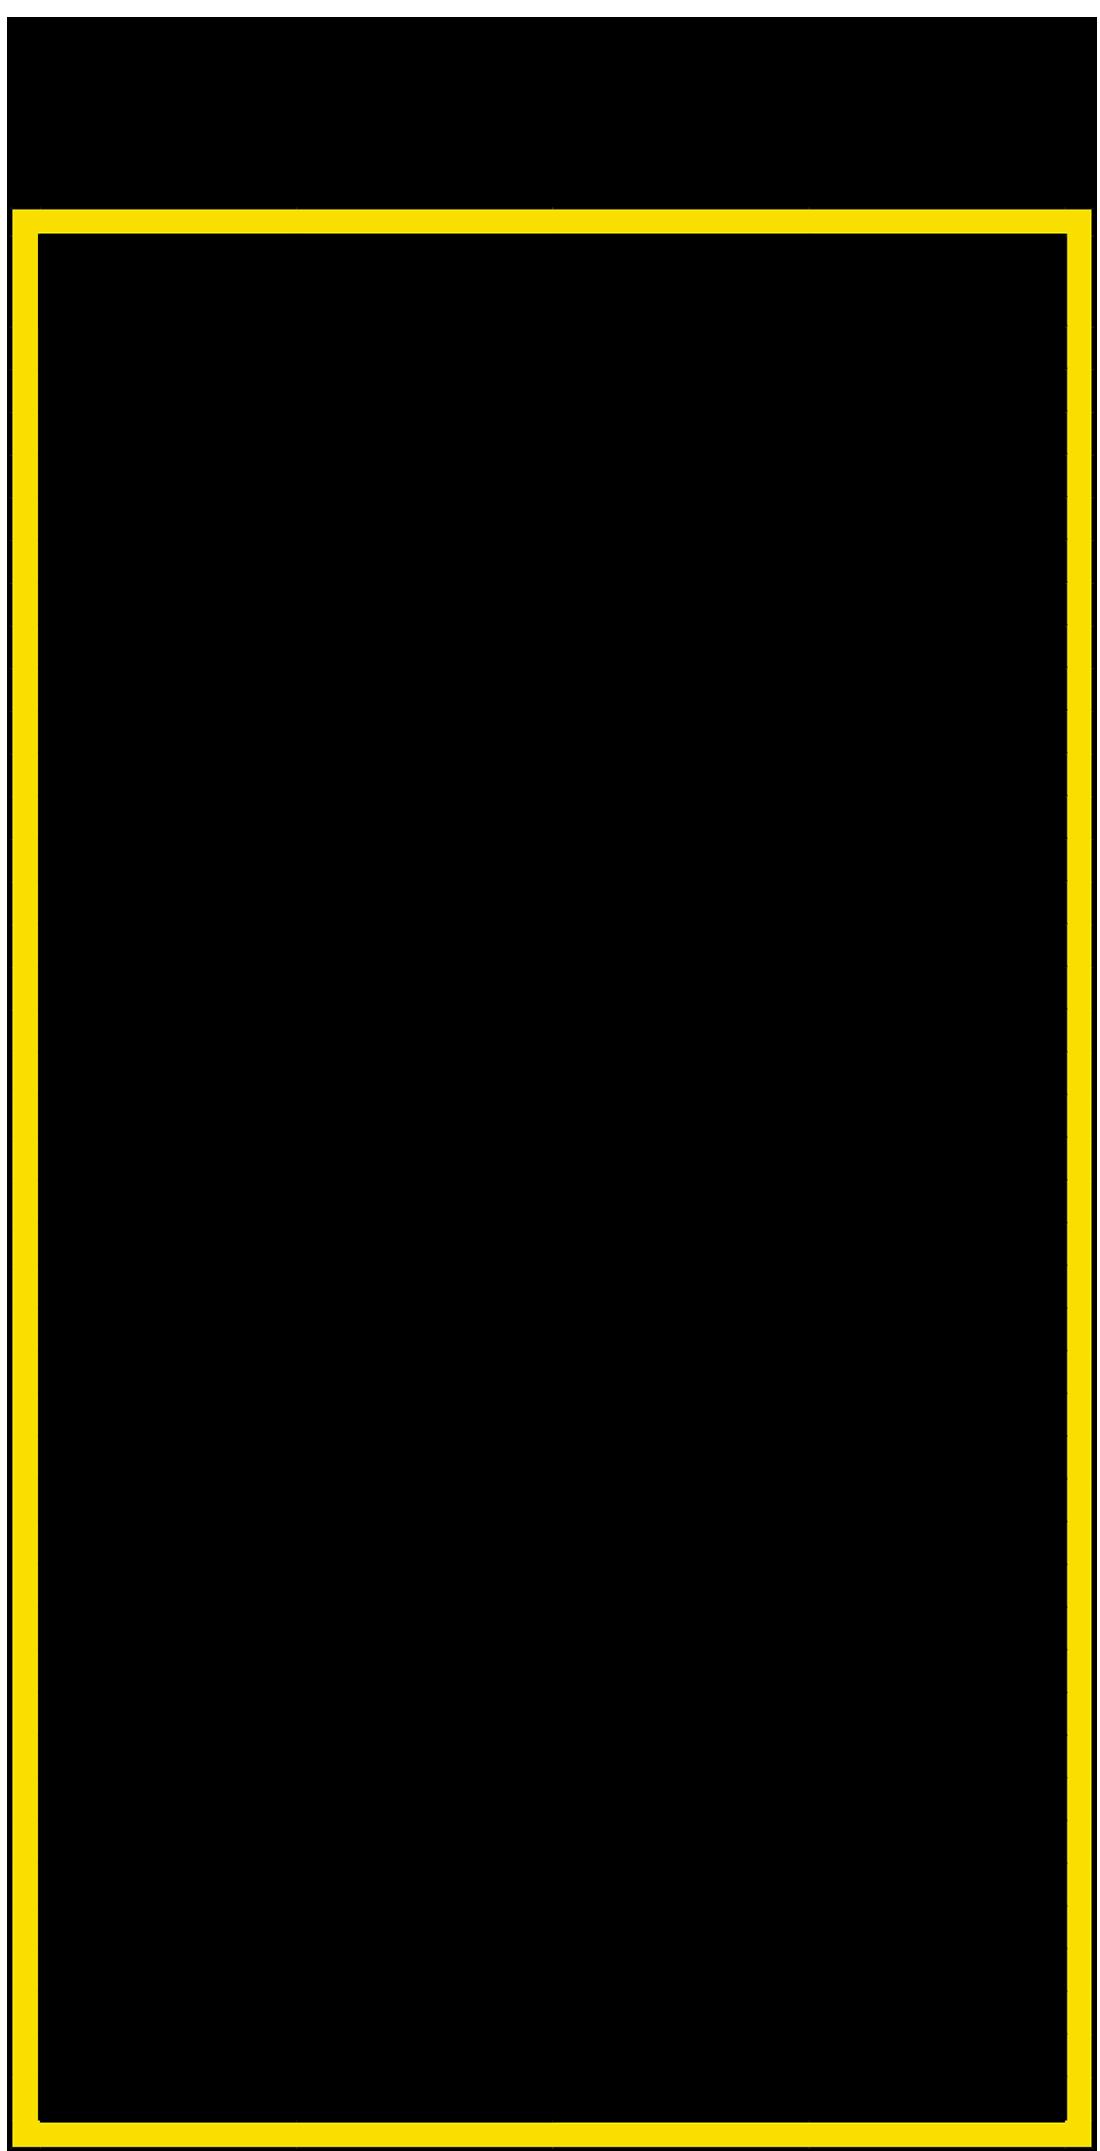 CourseHandicap-randa-uspga-men-yellow